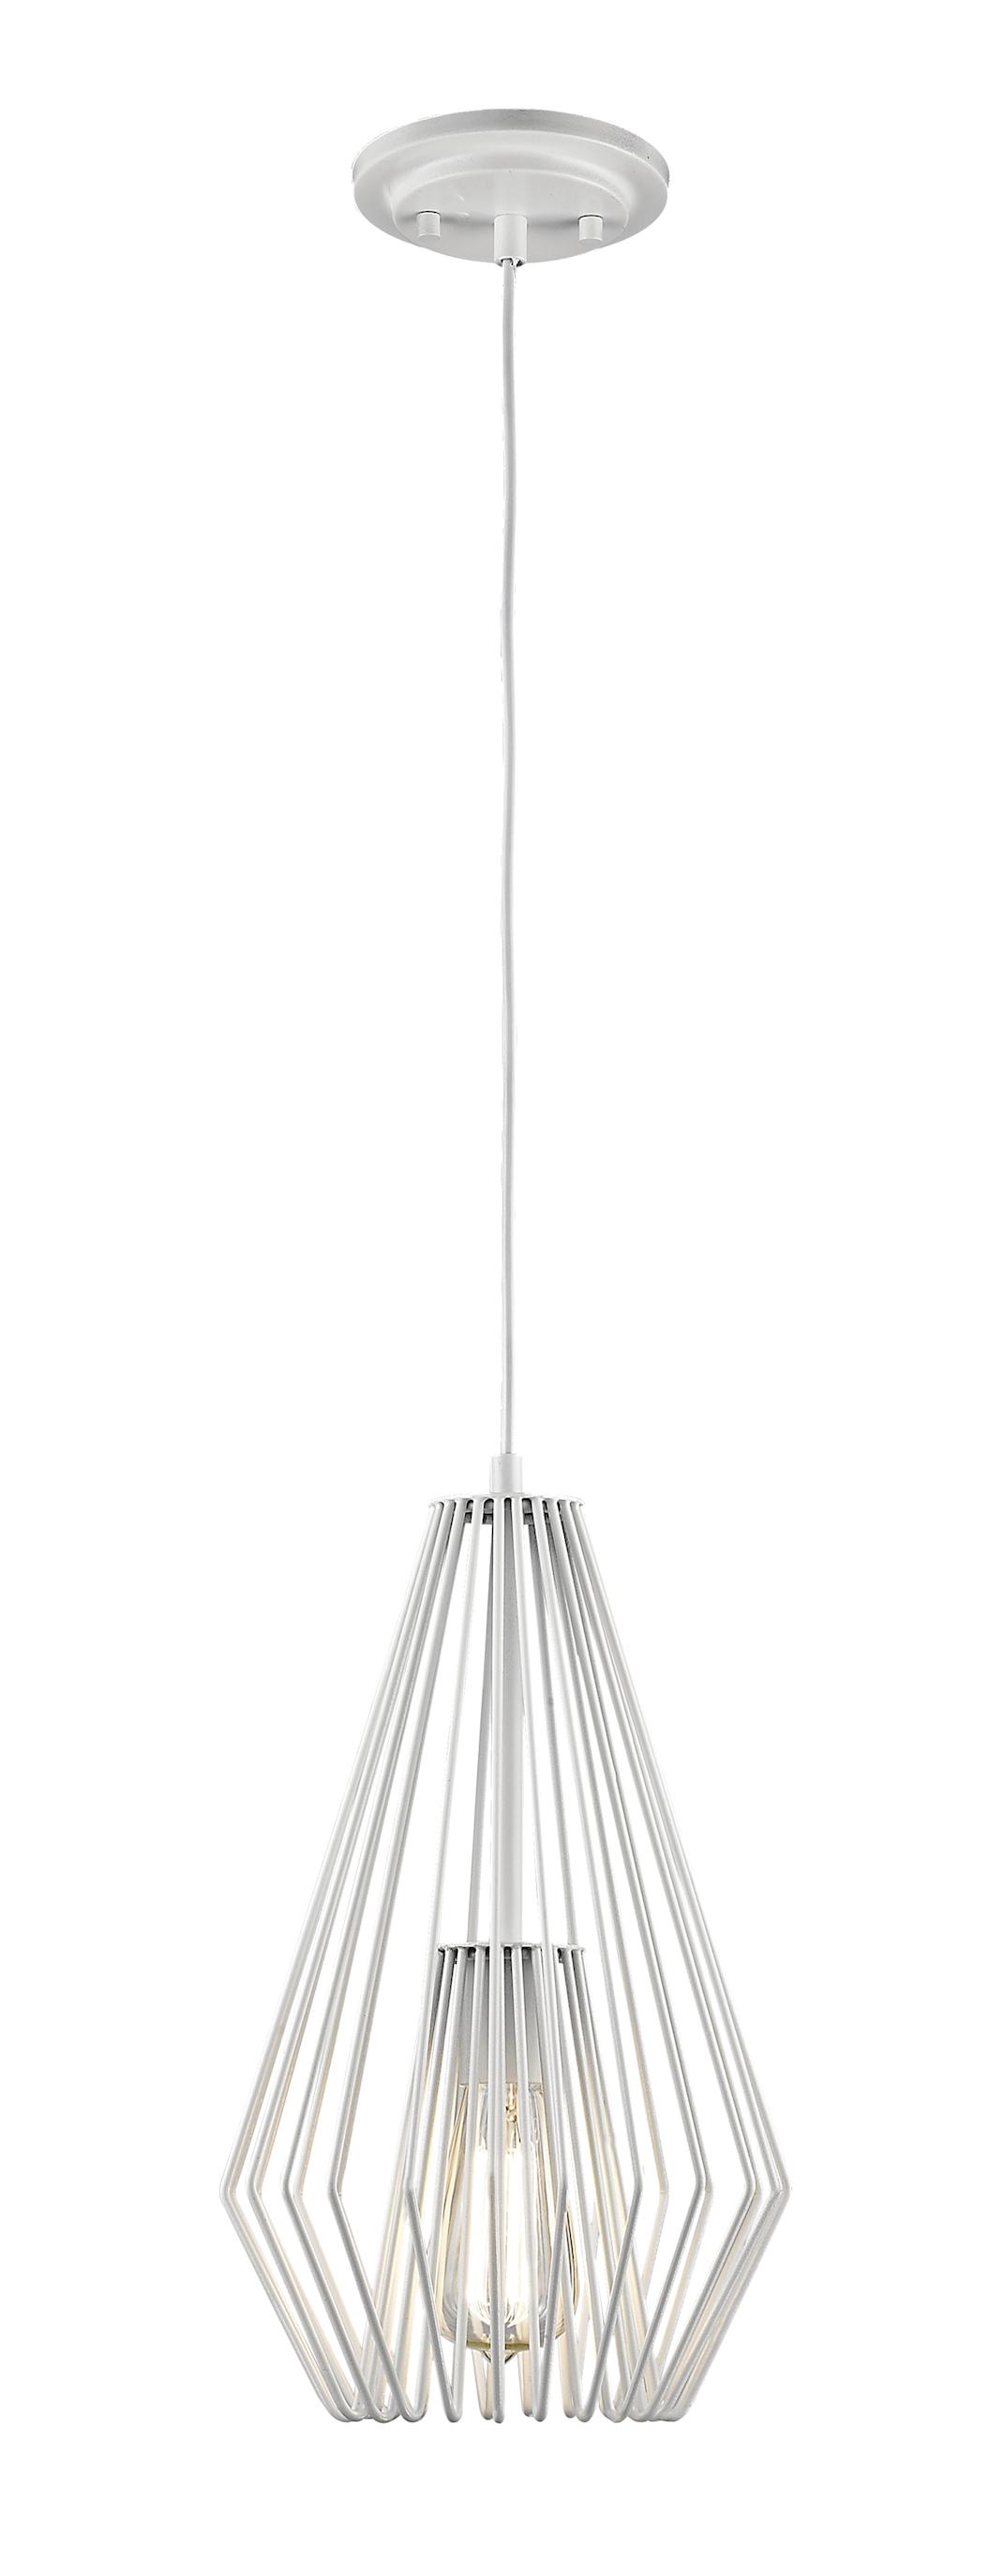 Pendant Lighting Transitional Modern QUINTUS Z-Lite 442MP-WH